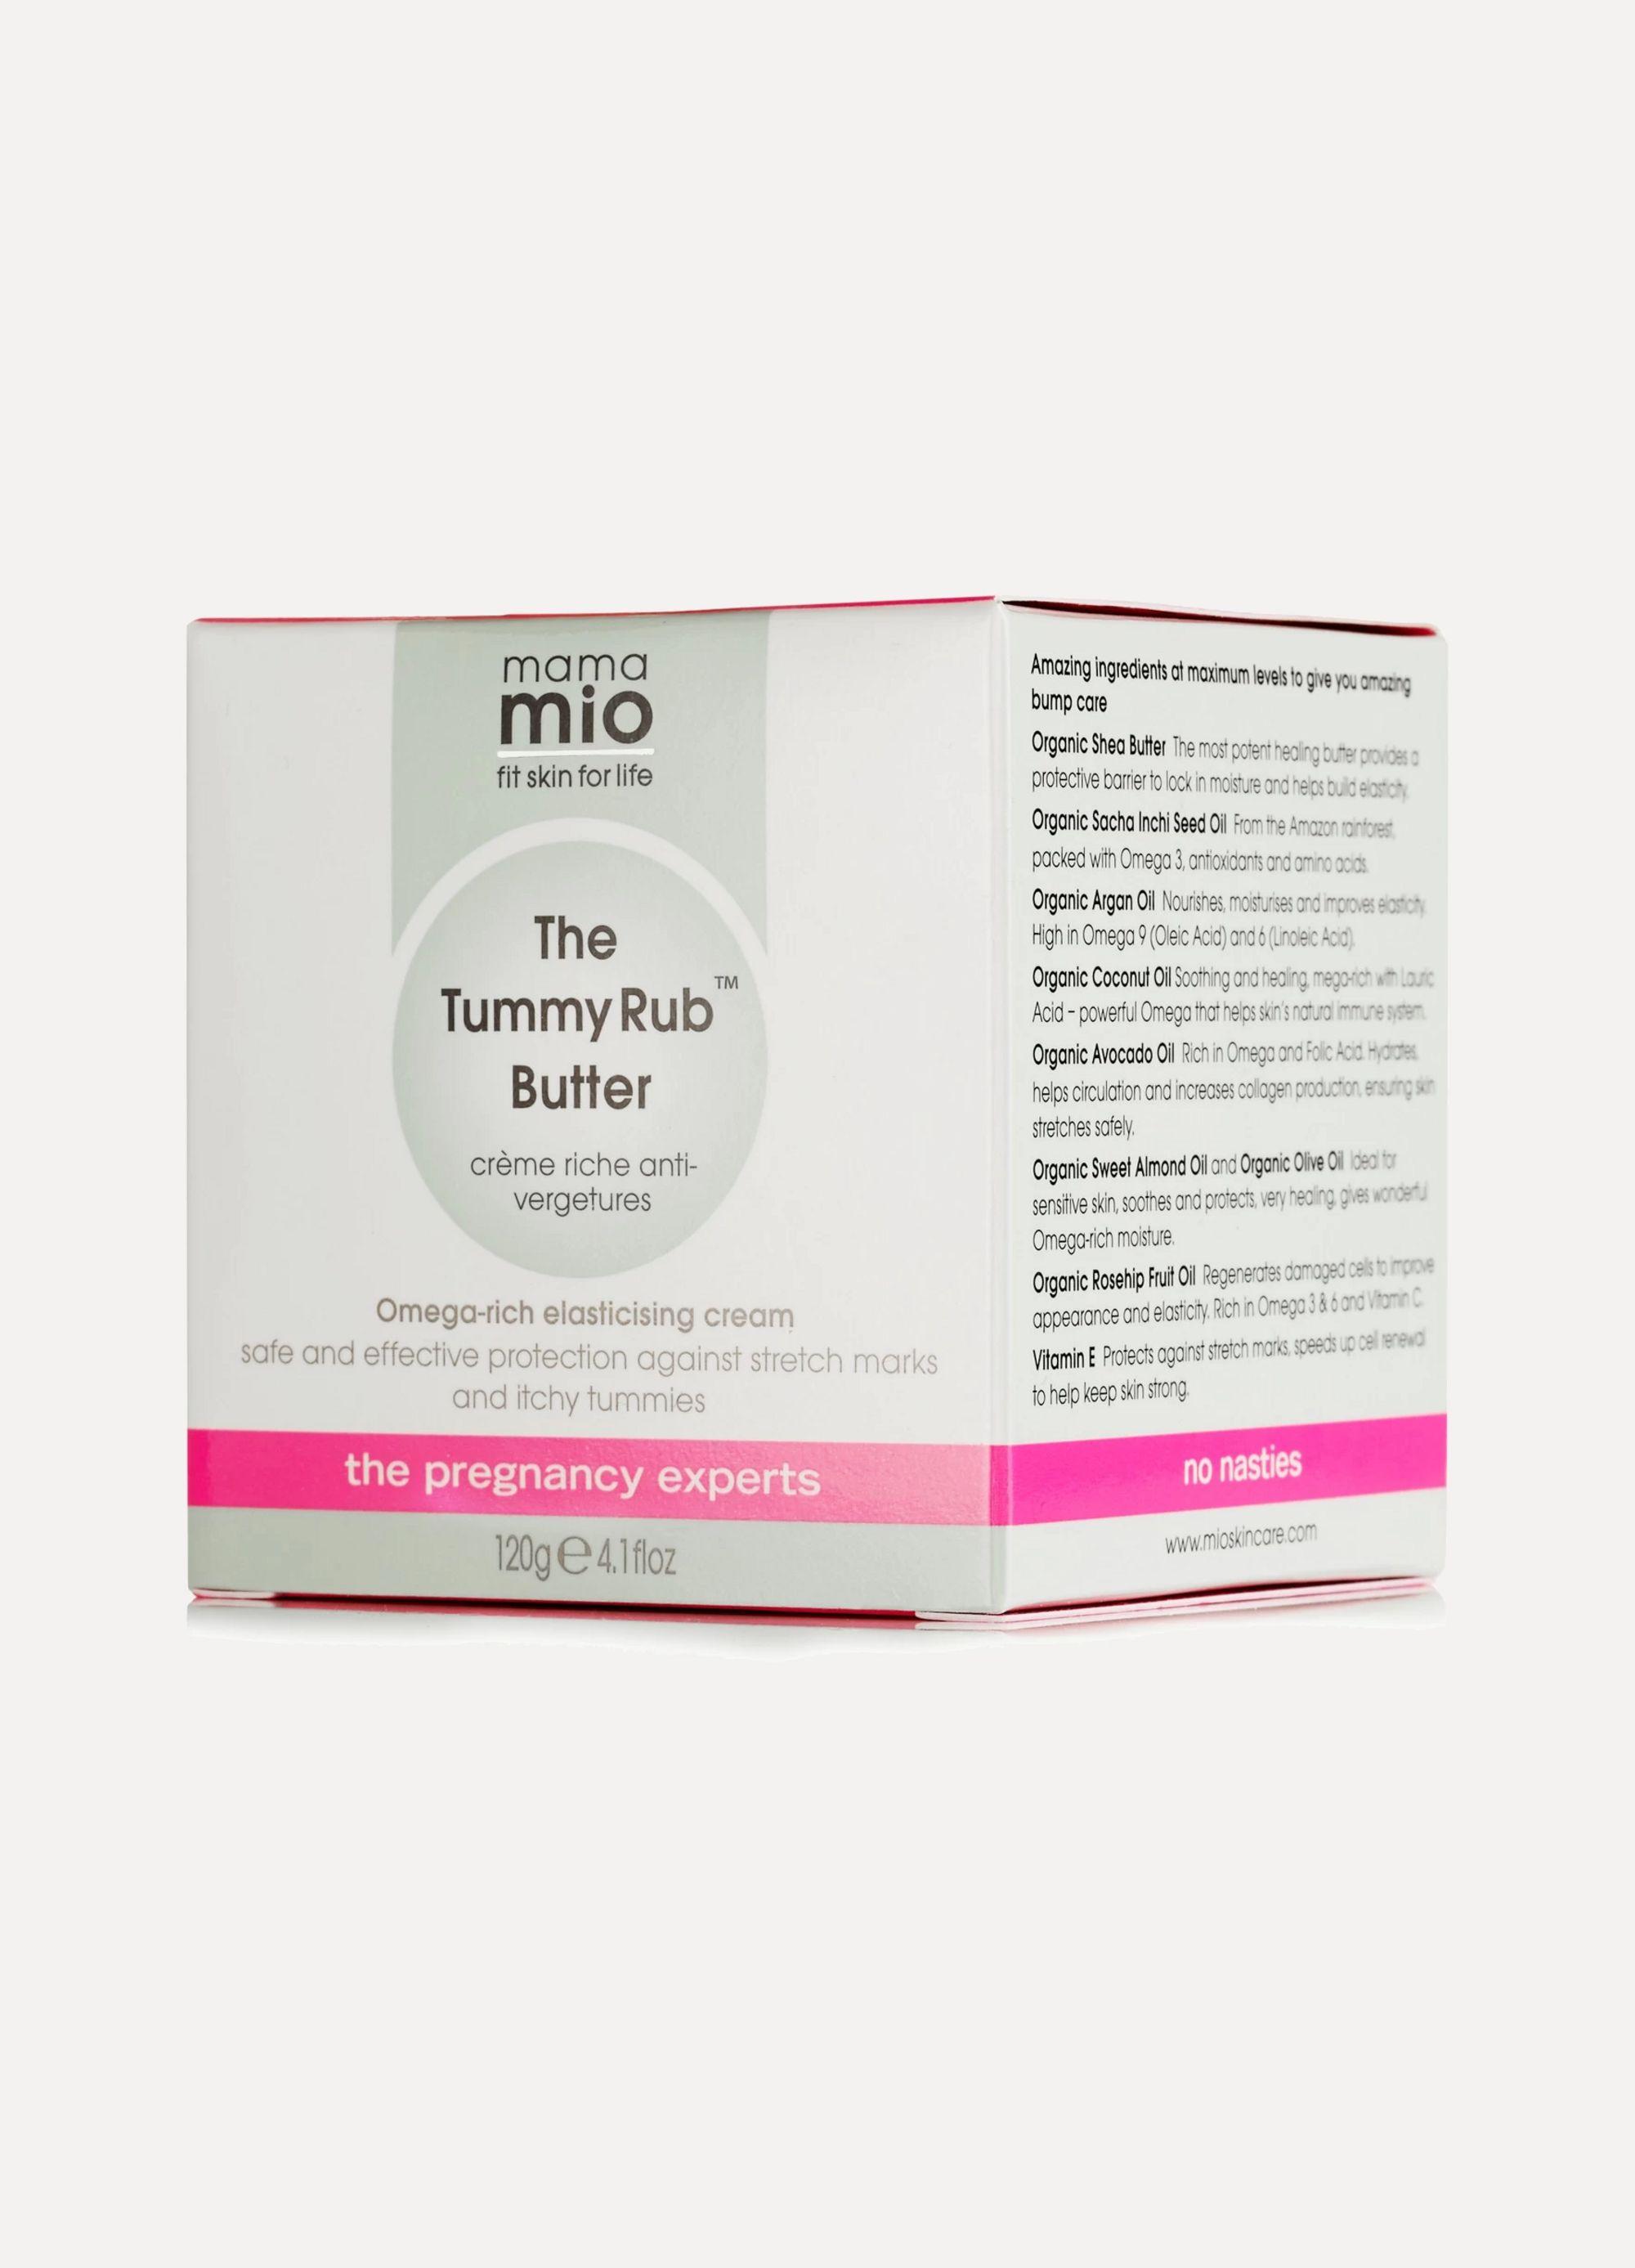 Mama Mio Crème anti-vergetures The Tummy Rub Butter, 120g